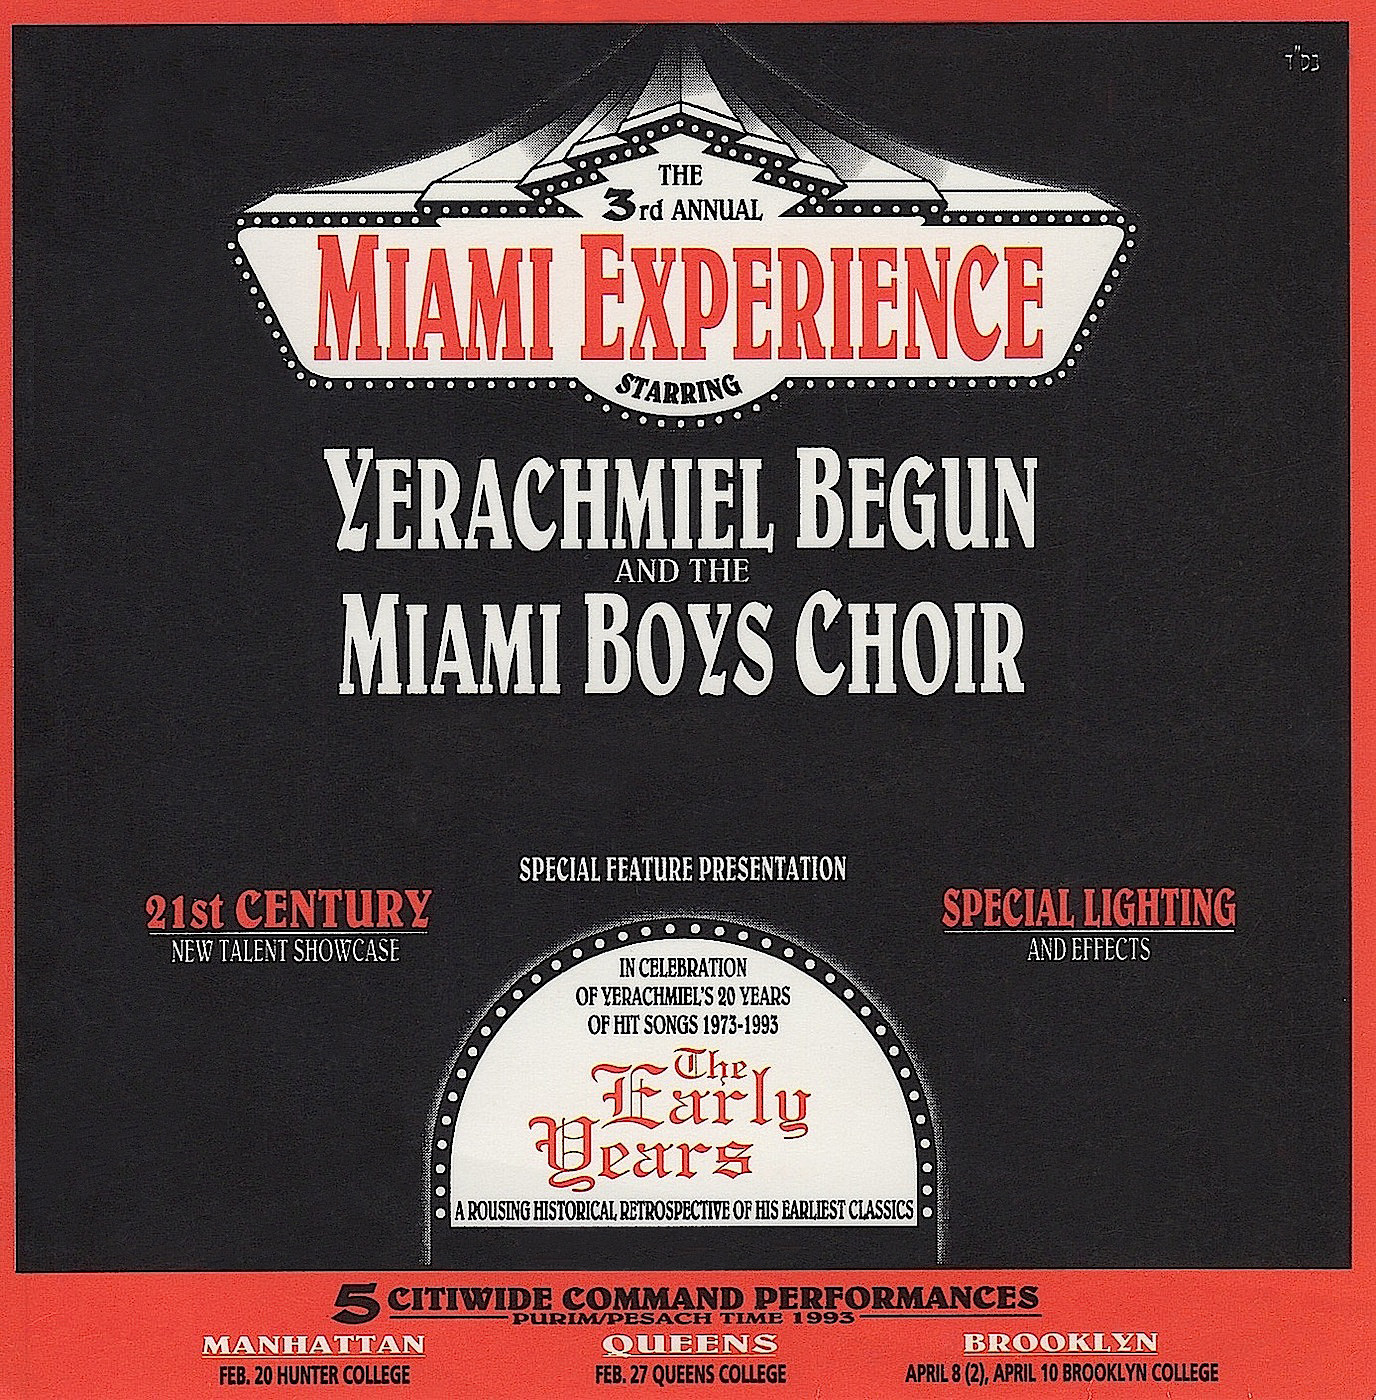 MIAMI EXPERIENCE 3 1993